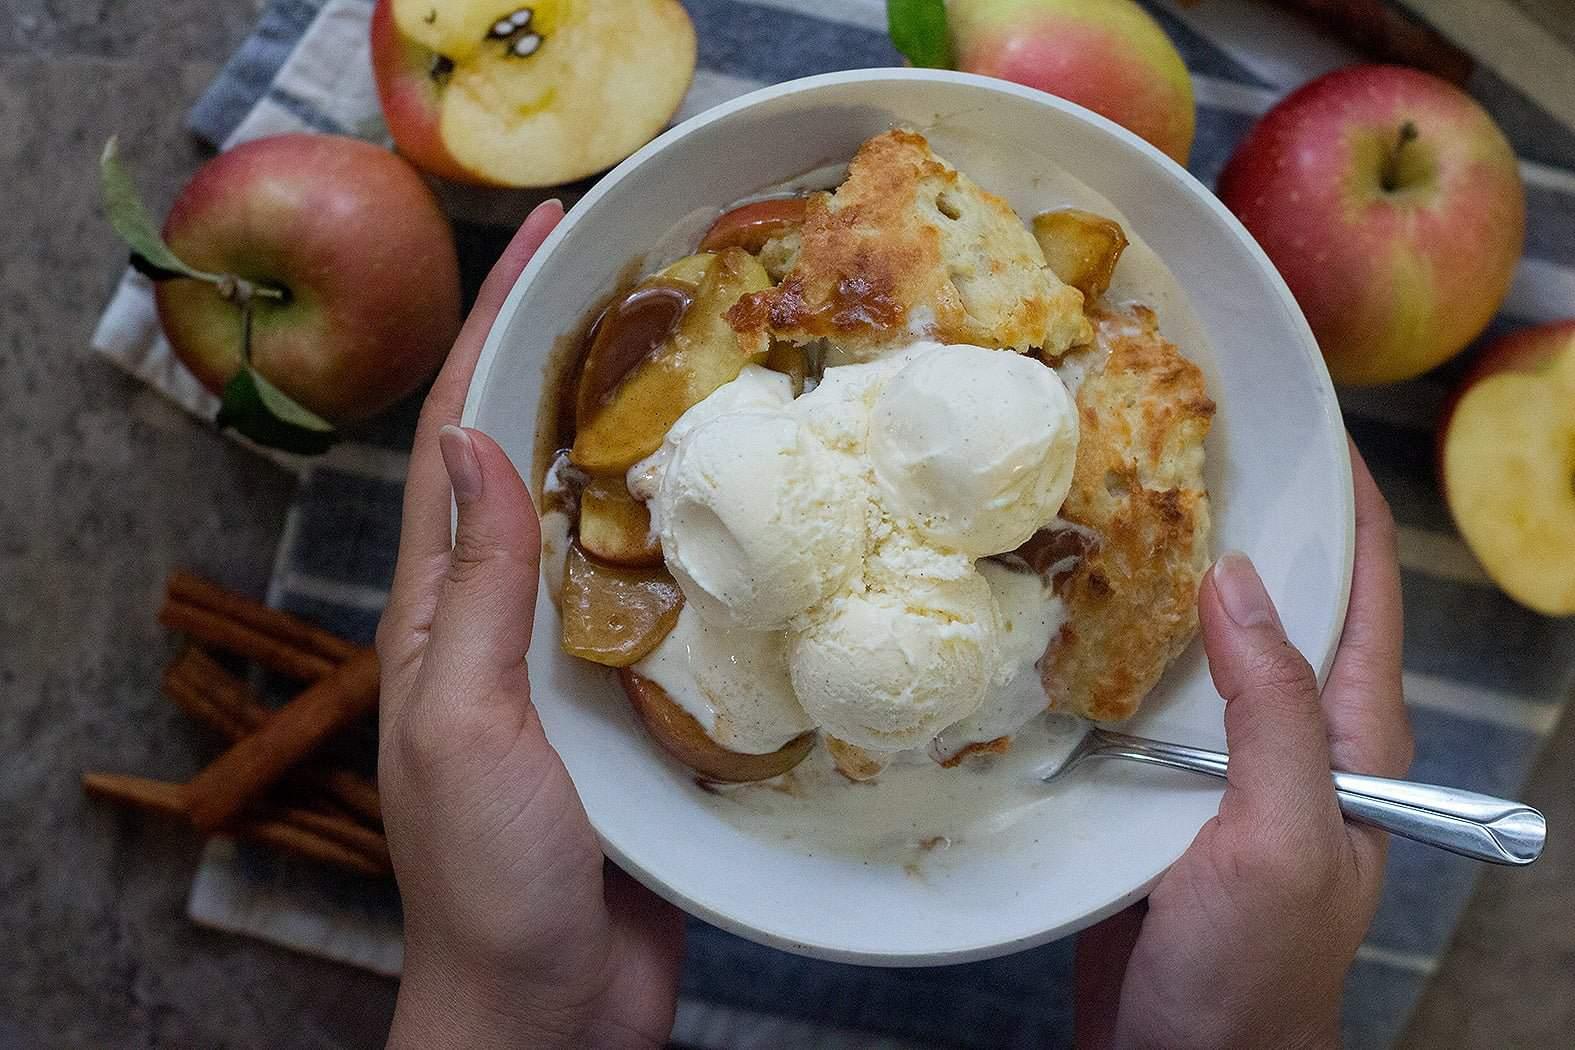 Serve homemade apple cobbler with vanilla ice cream.